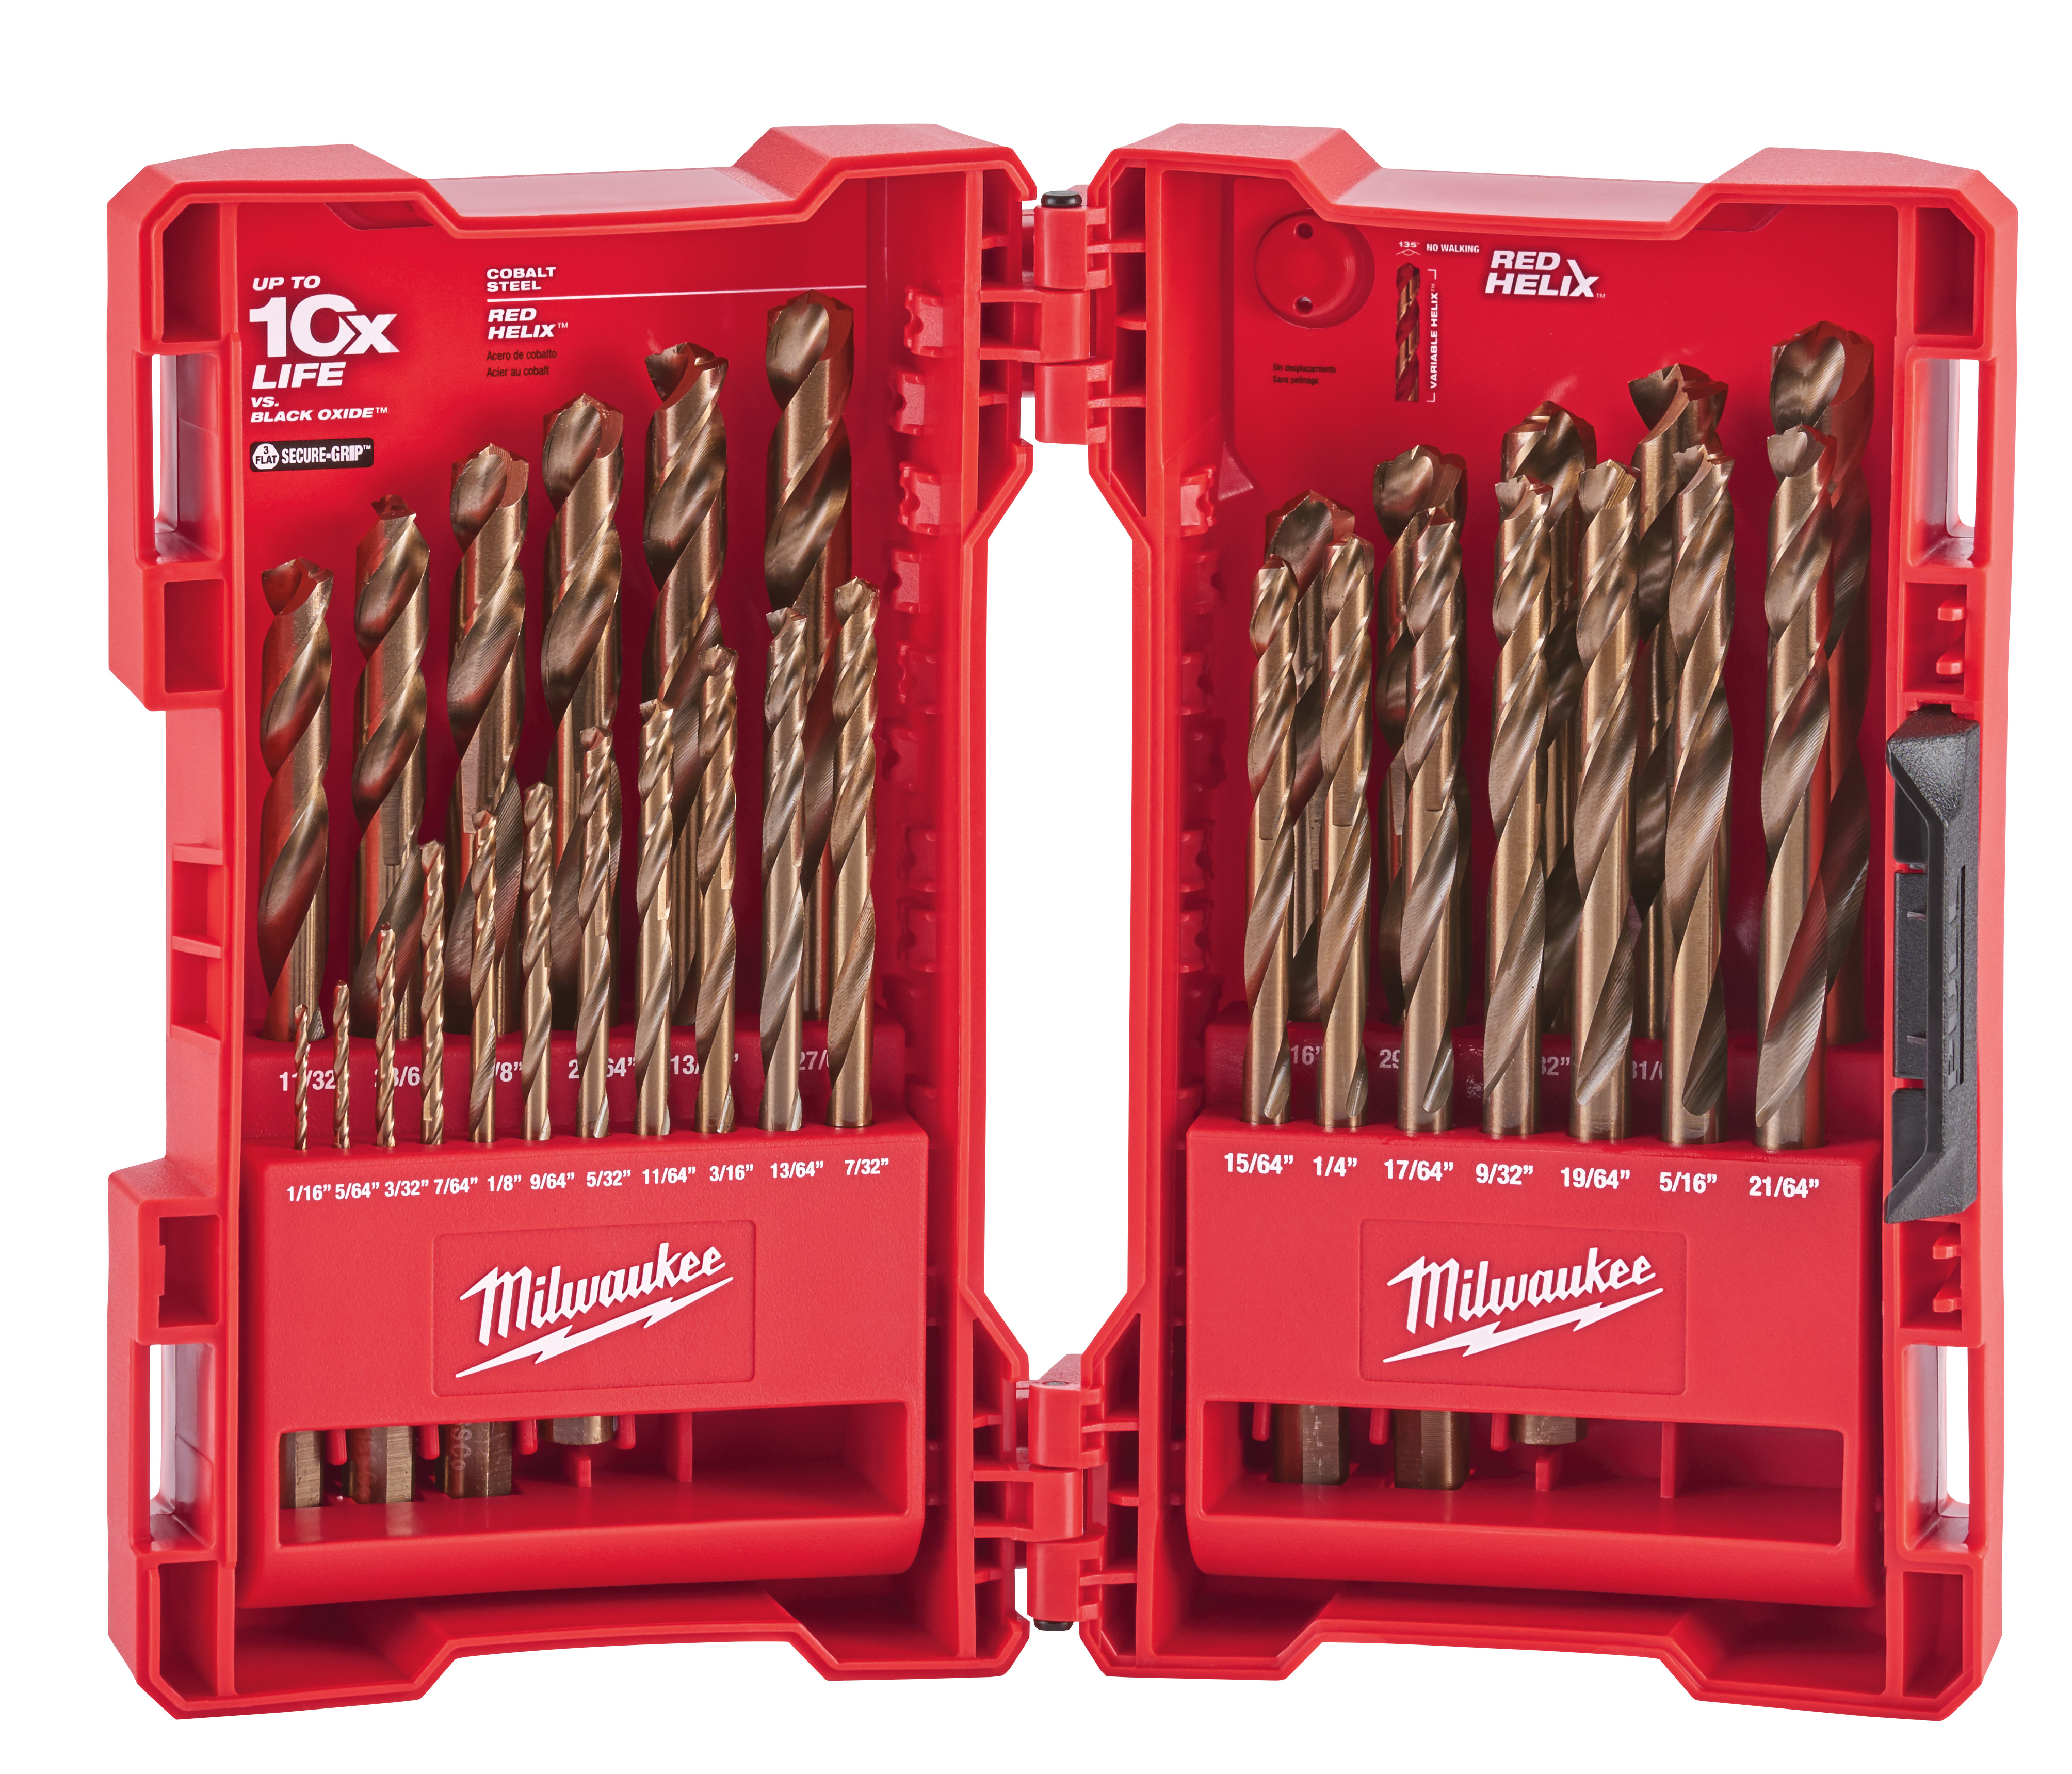 Milwaukee® RED HELIX® 48-89-2332 Drill Bit Set, 1/16 in Min Drill Bit, 1/2 in Max Drill Bit, 135 deg Drill Point Angle, 29 Pieces, Cobalt